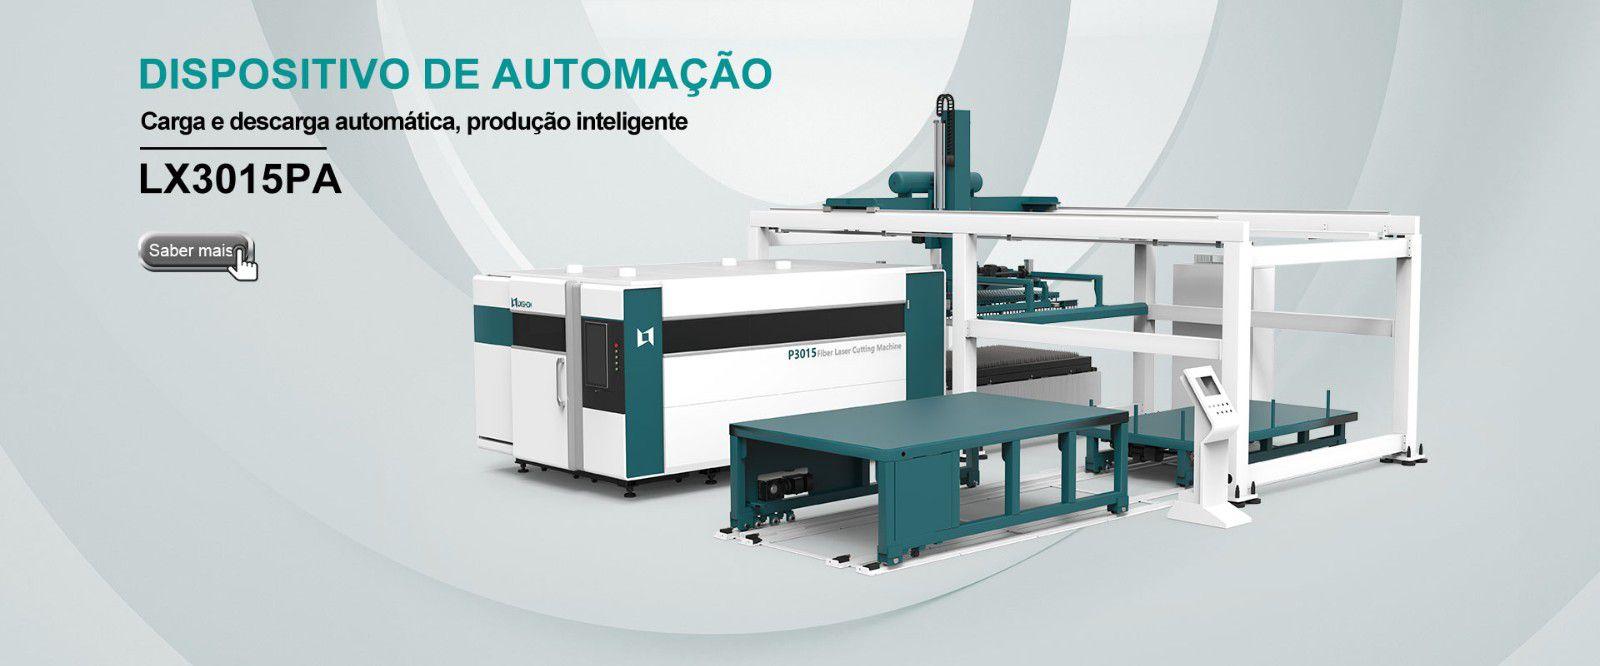 Cortador automático a laser de fibra LX3015PA